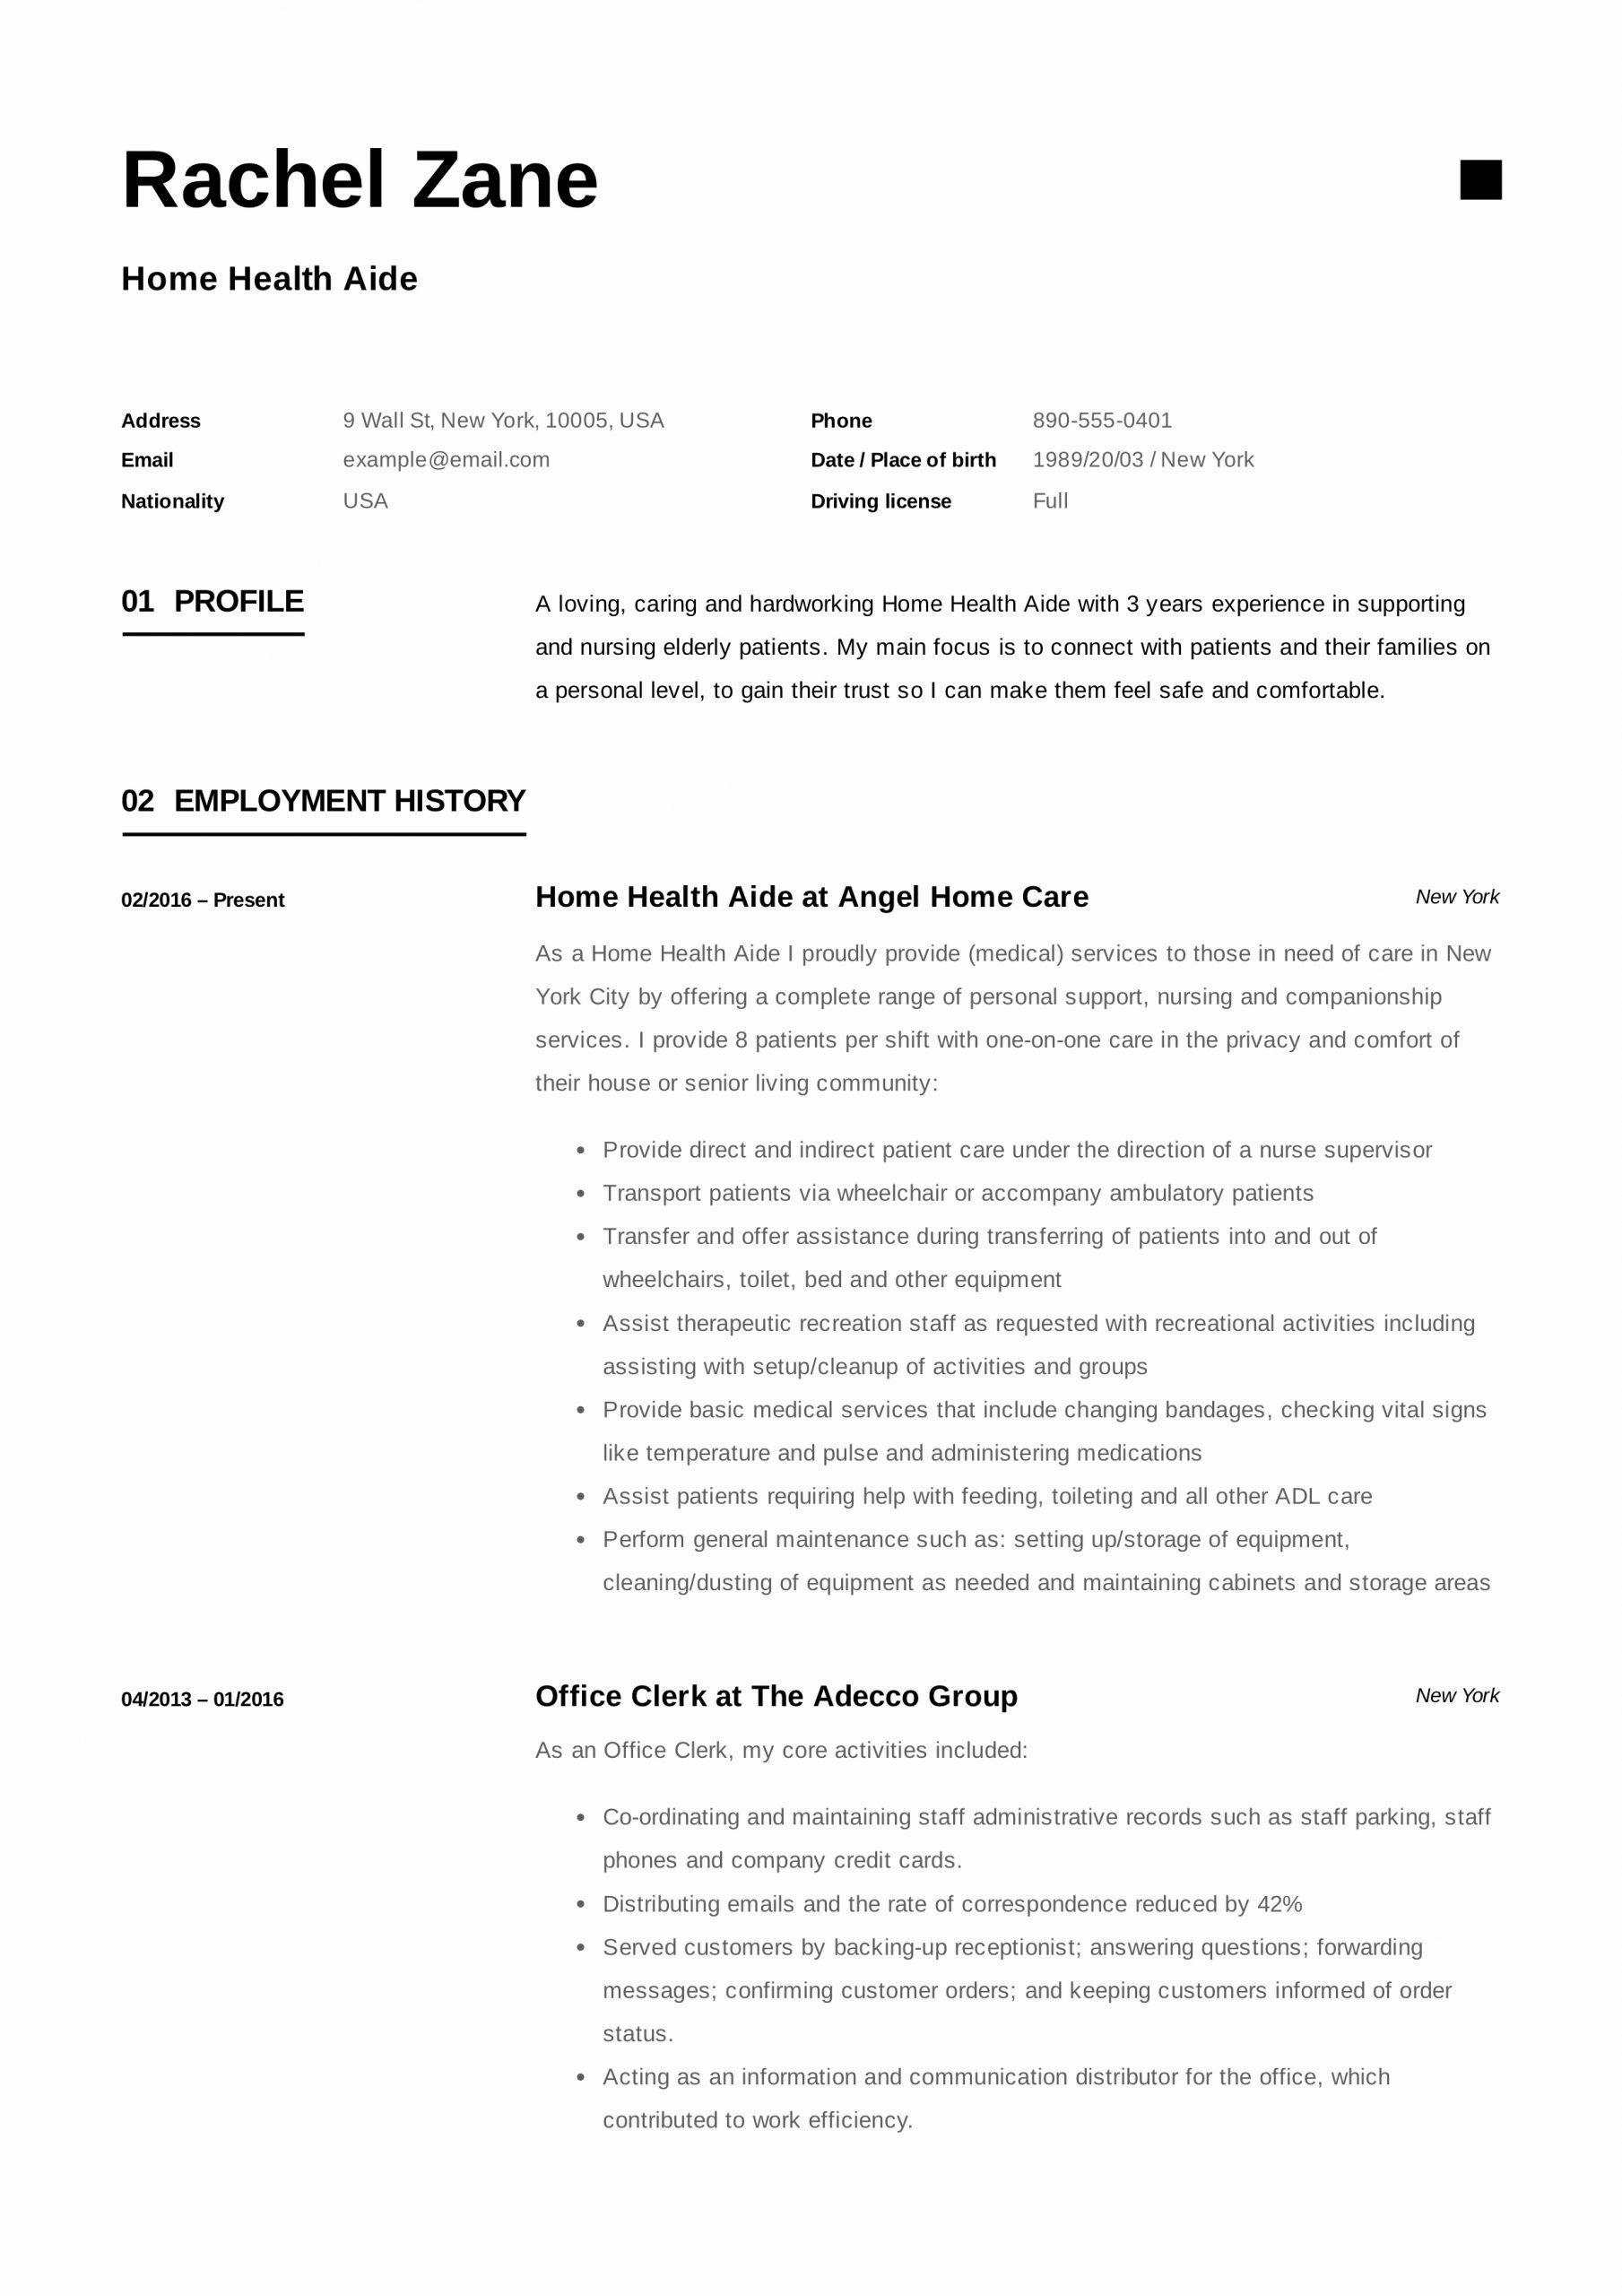 Home Health Aide Job Description Resume Elegant Home Health Aide Resume Sample Writing Guide Home Health Aide Graphic Design Resume Resume Examples